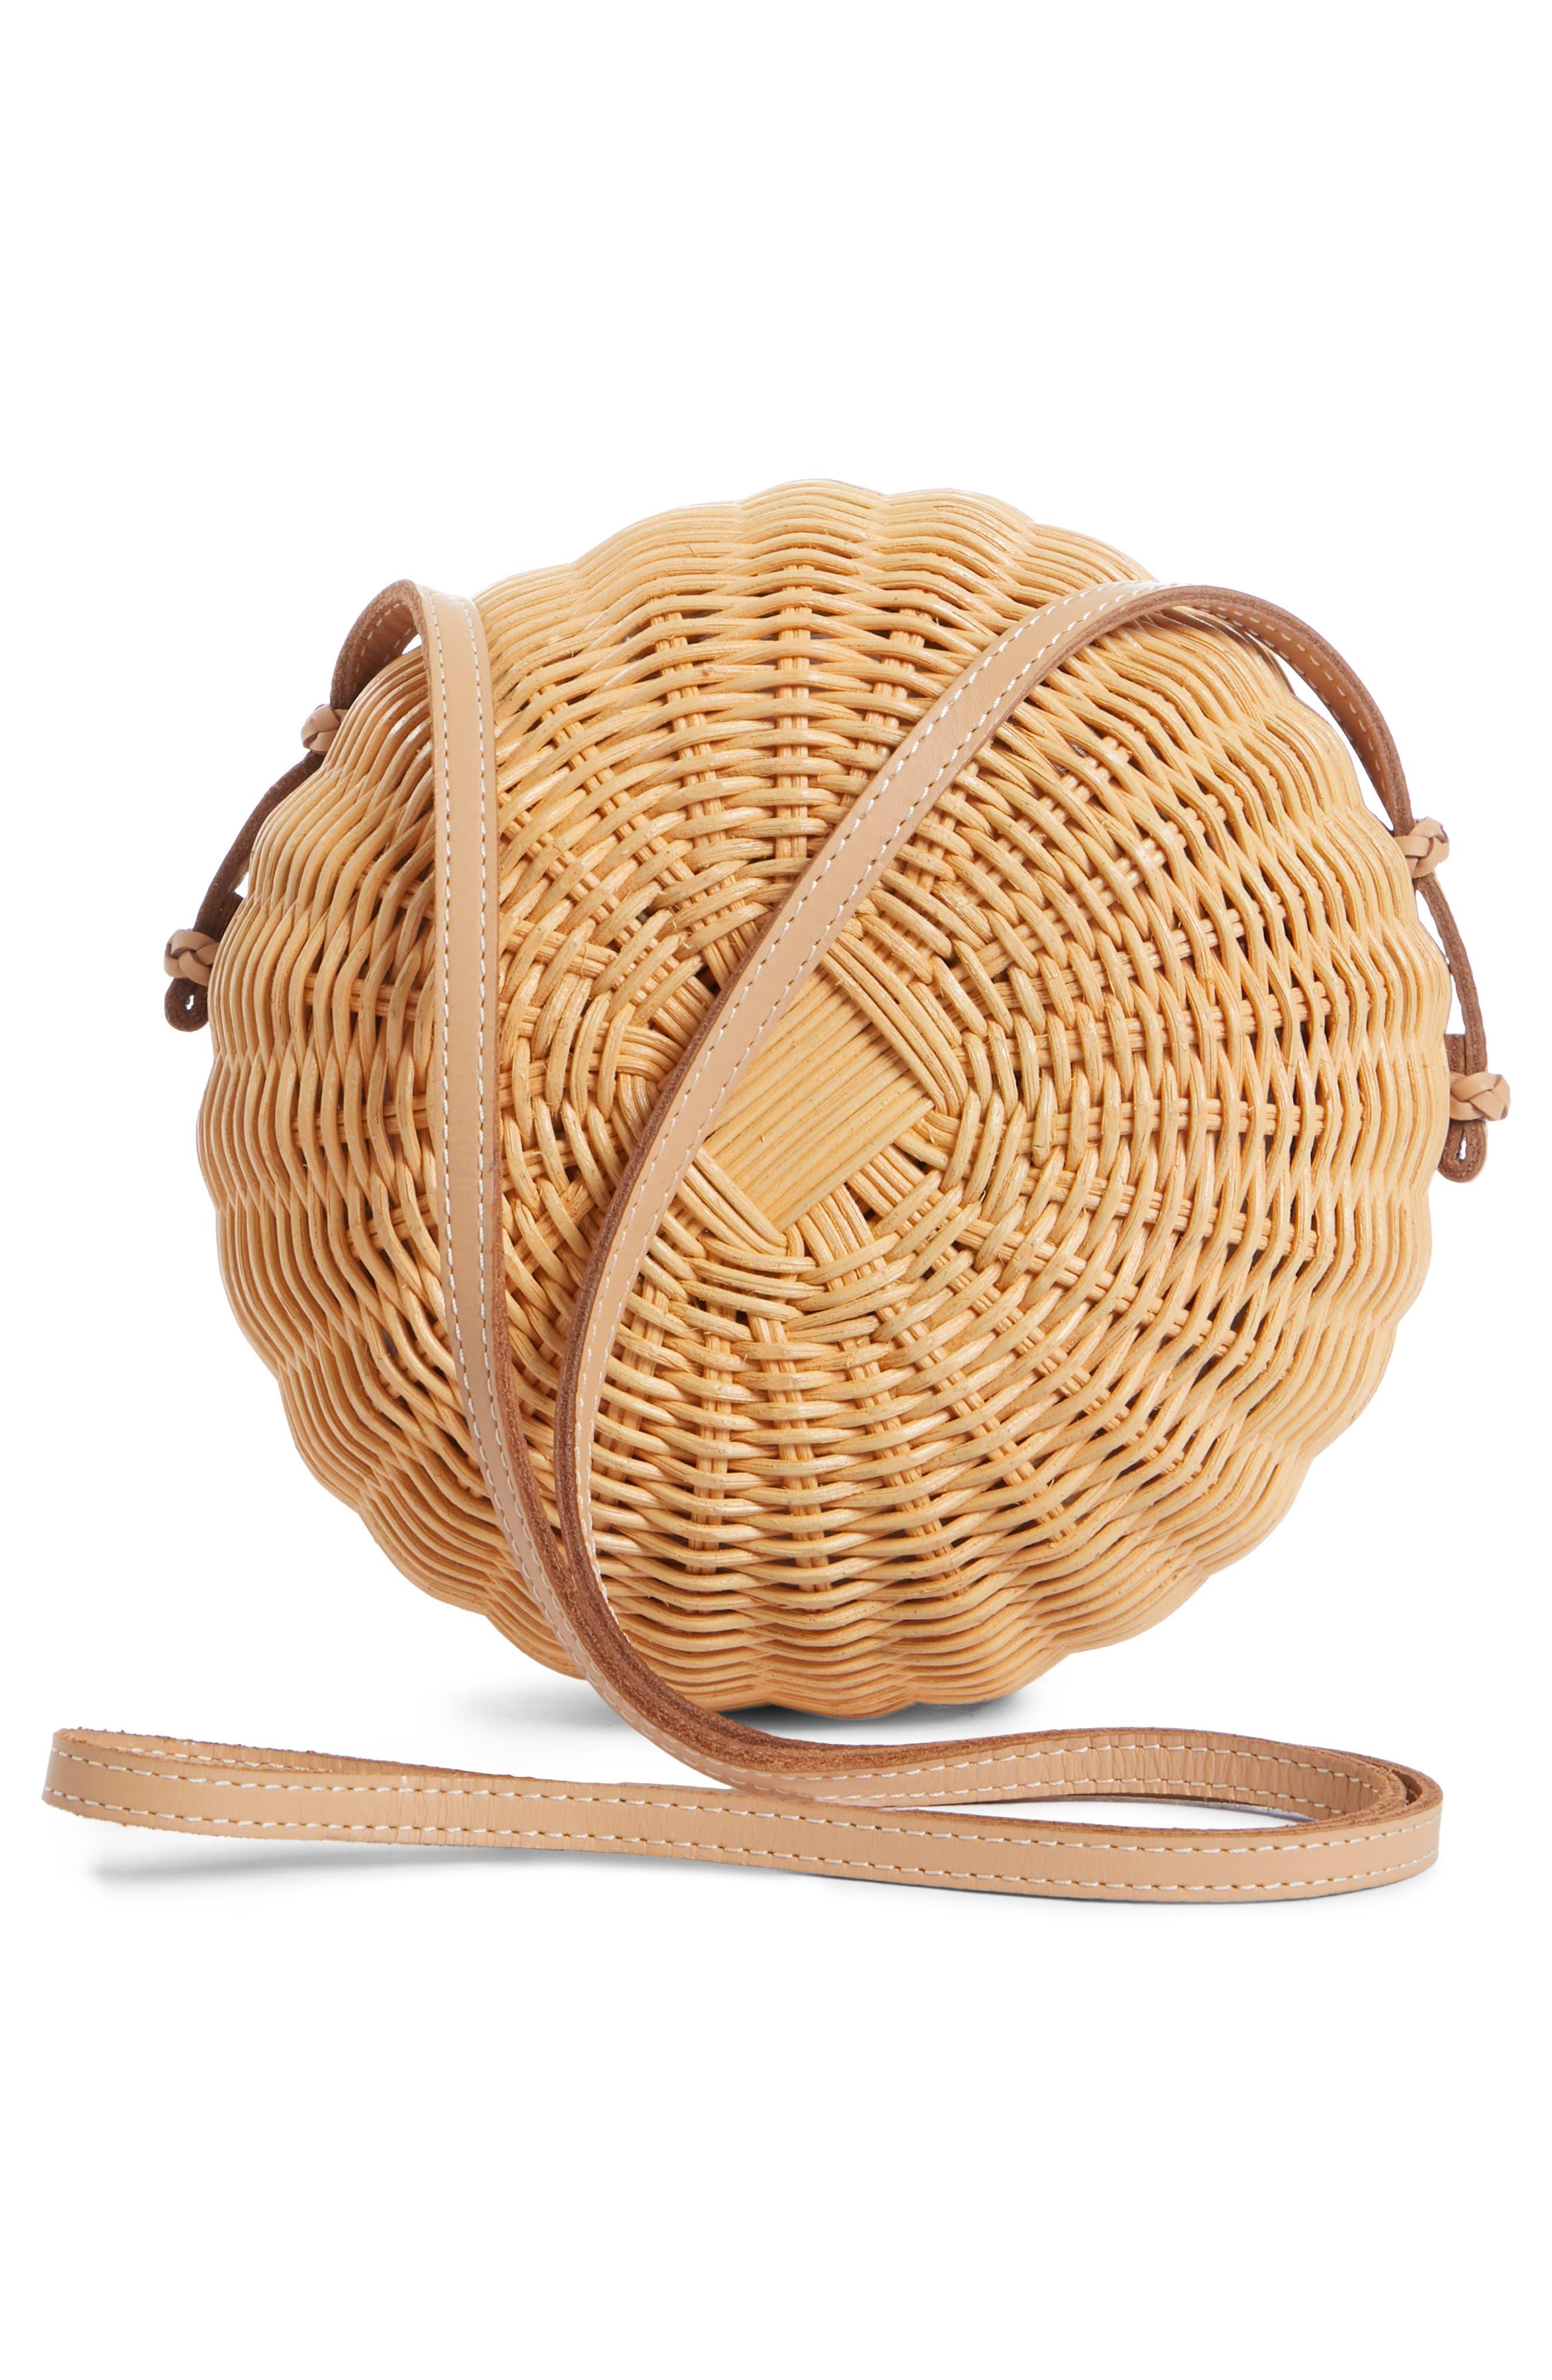 ULLA JOHNSON,                             Pomme Woven Rattan Shoulder Bag,                             Alternate thumbnail 3, color,                             NATURAL